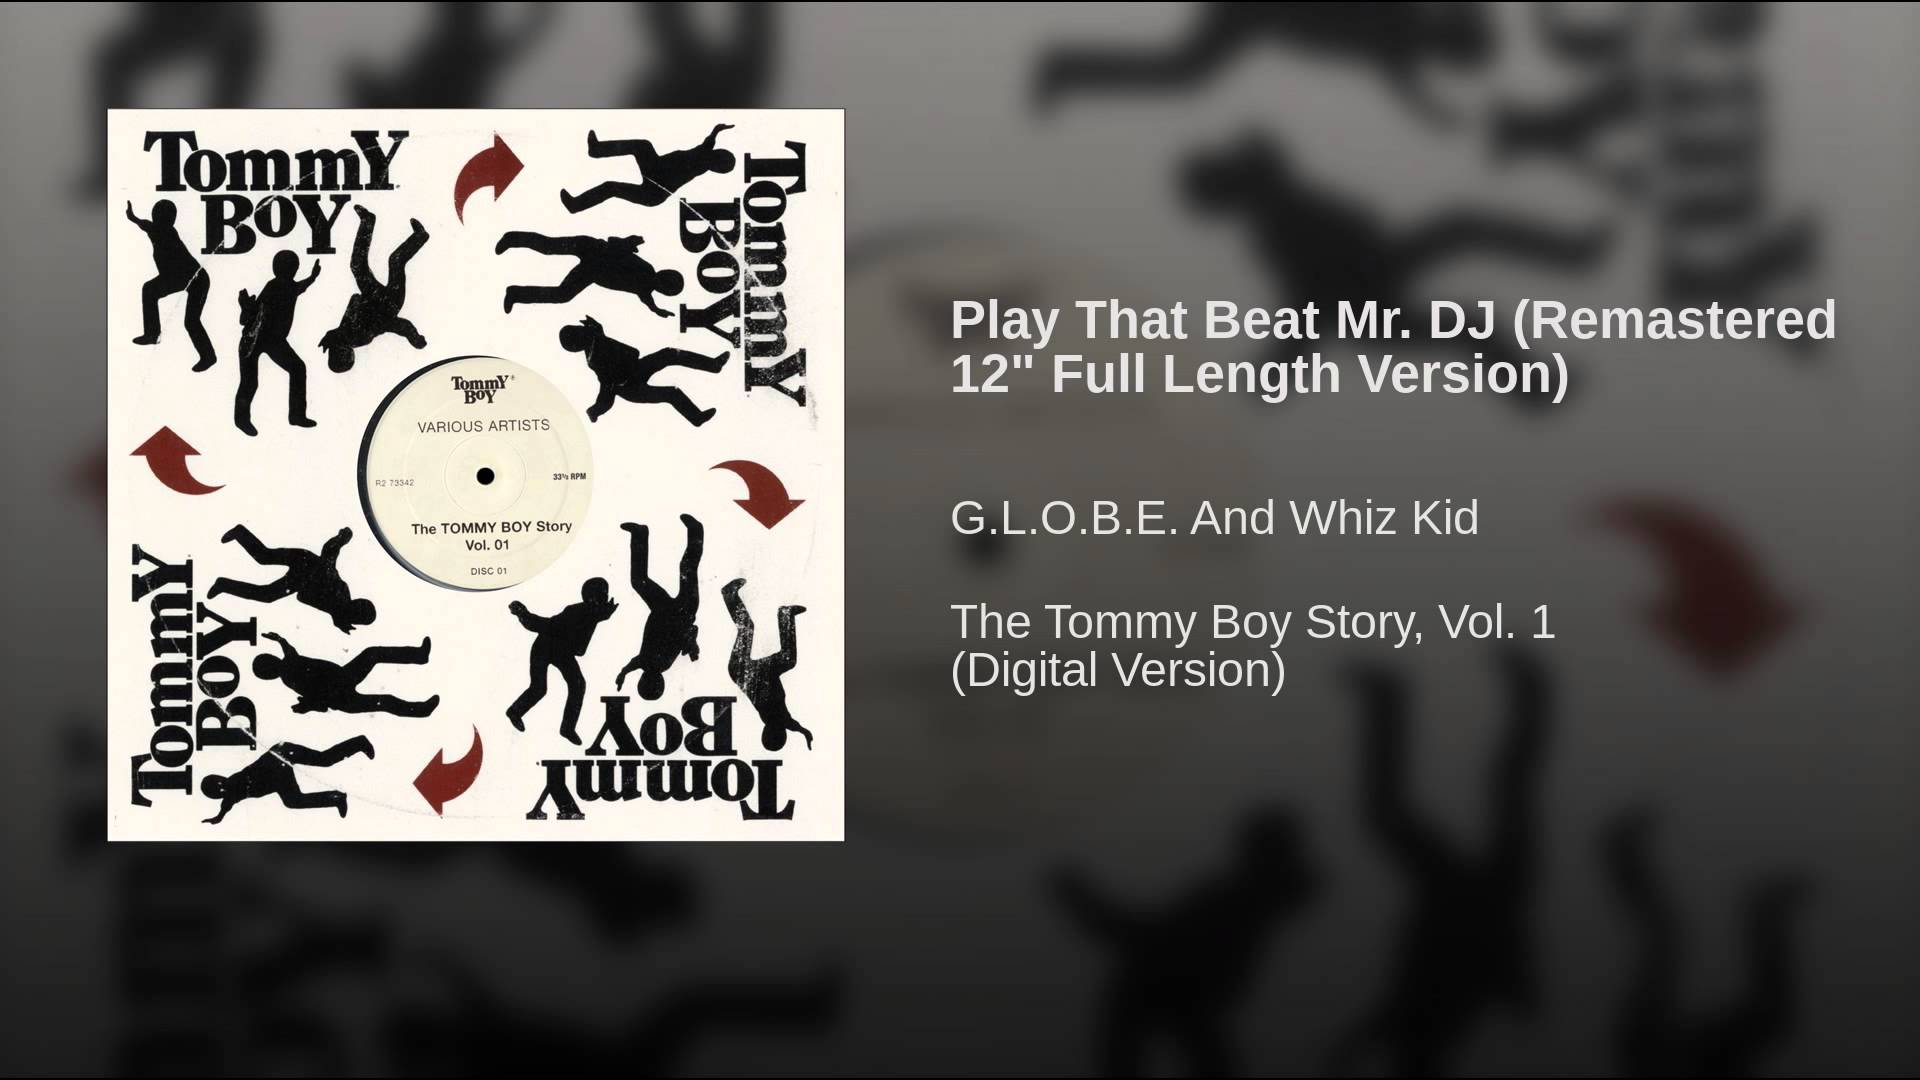 G.L.O.B.E. And Whiz Kid – Play That Beat Mr. DJ (Remastered 12″)